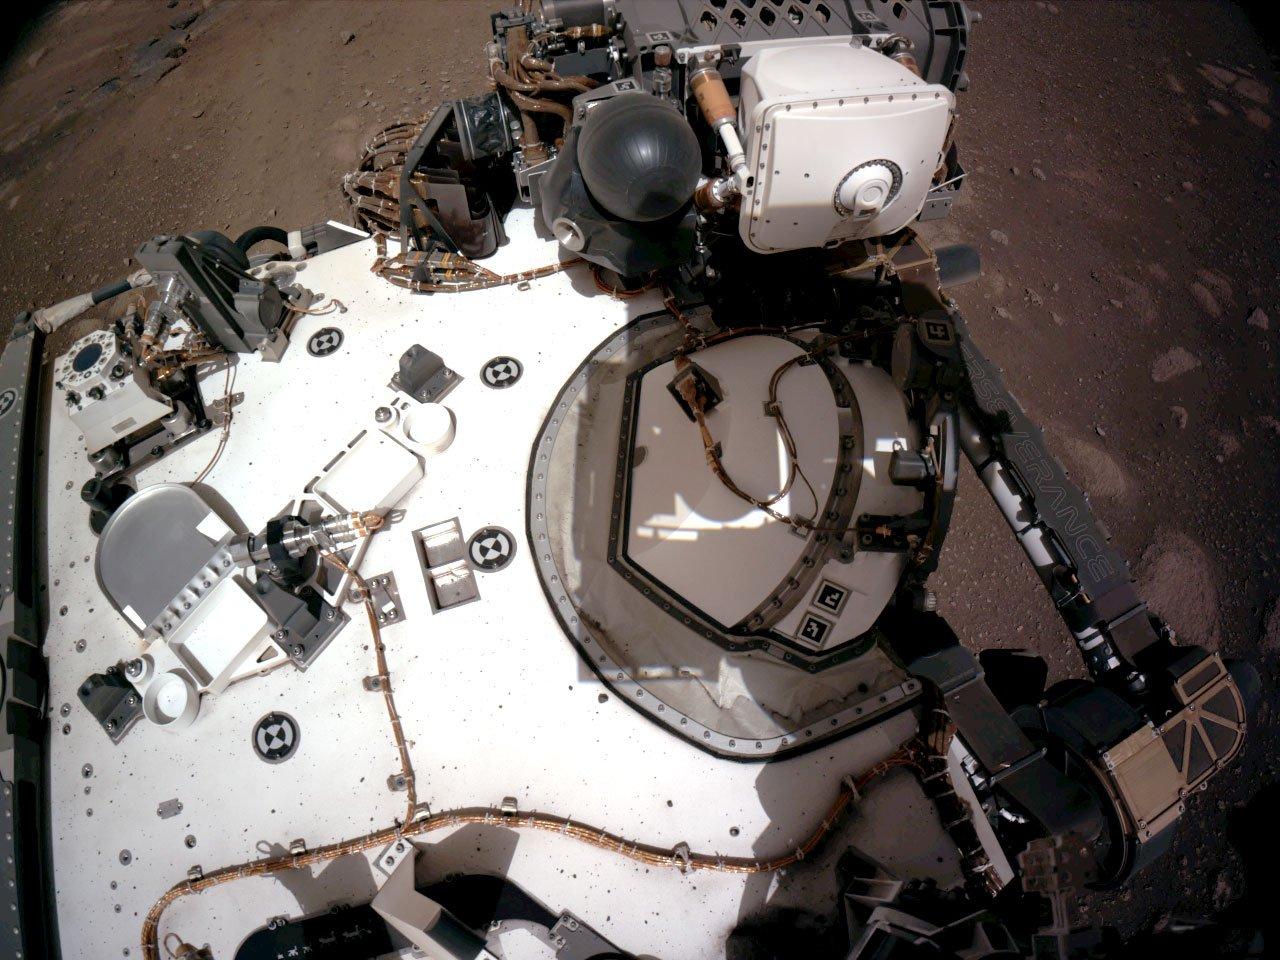 NASA公佈毅力號登陸火星時記錄下的第一段錄音。(NASA/JPL-Caltech)